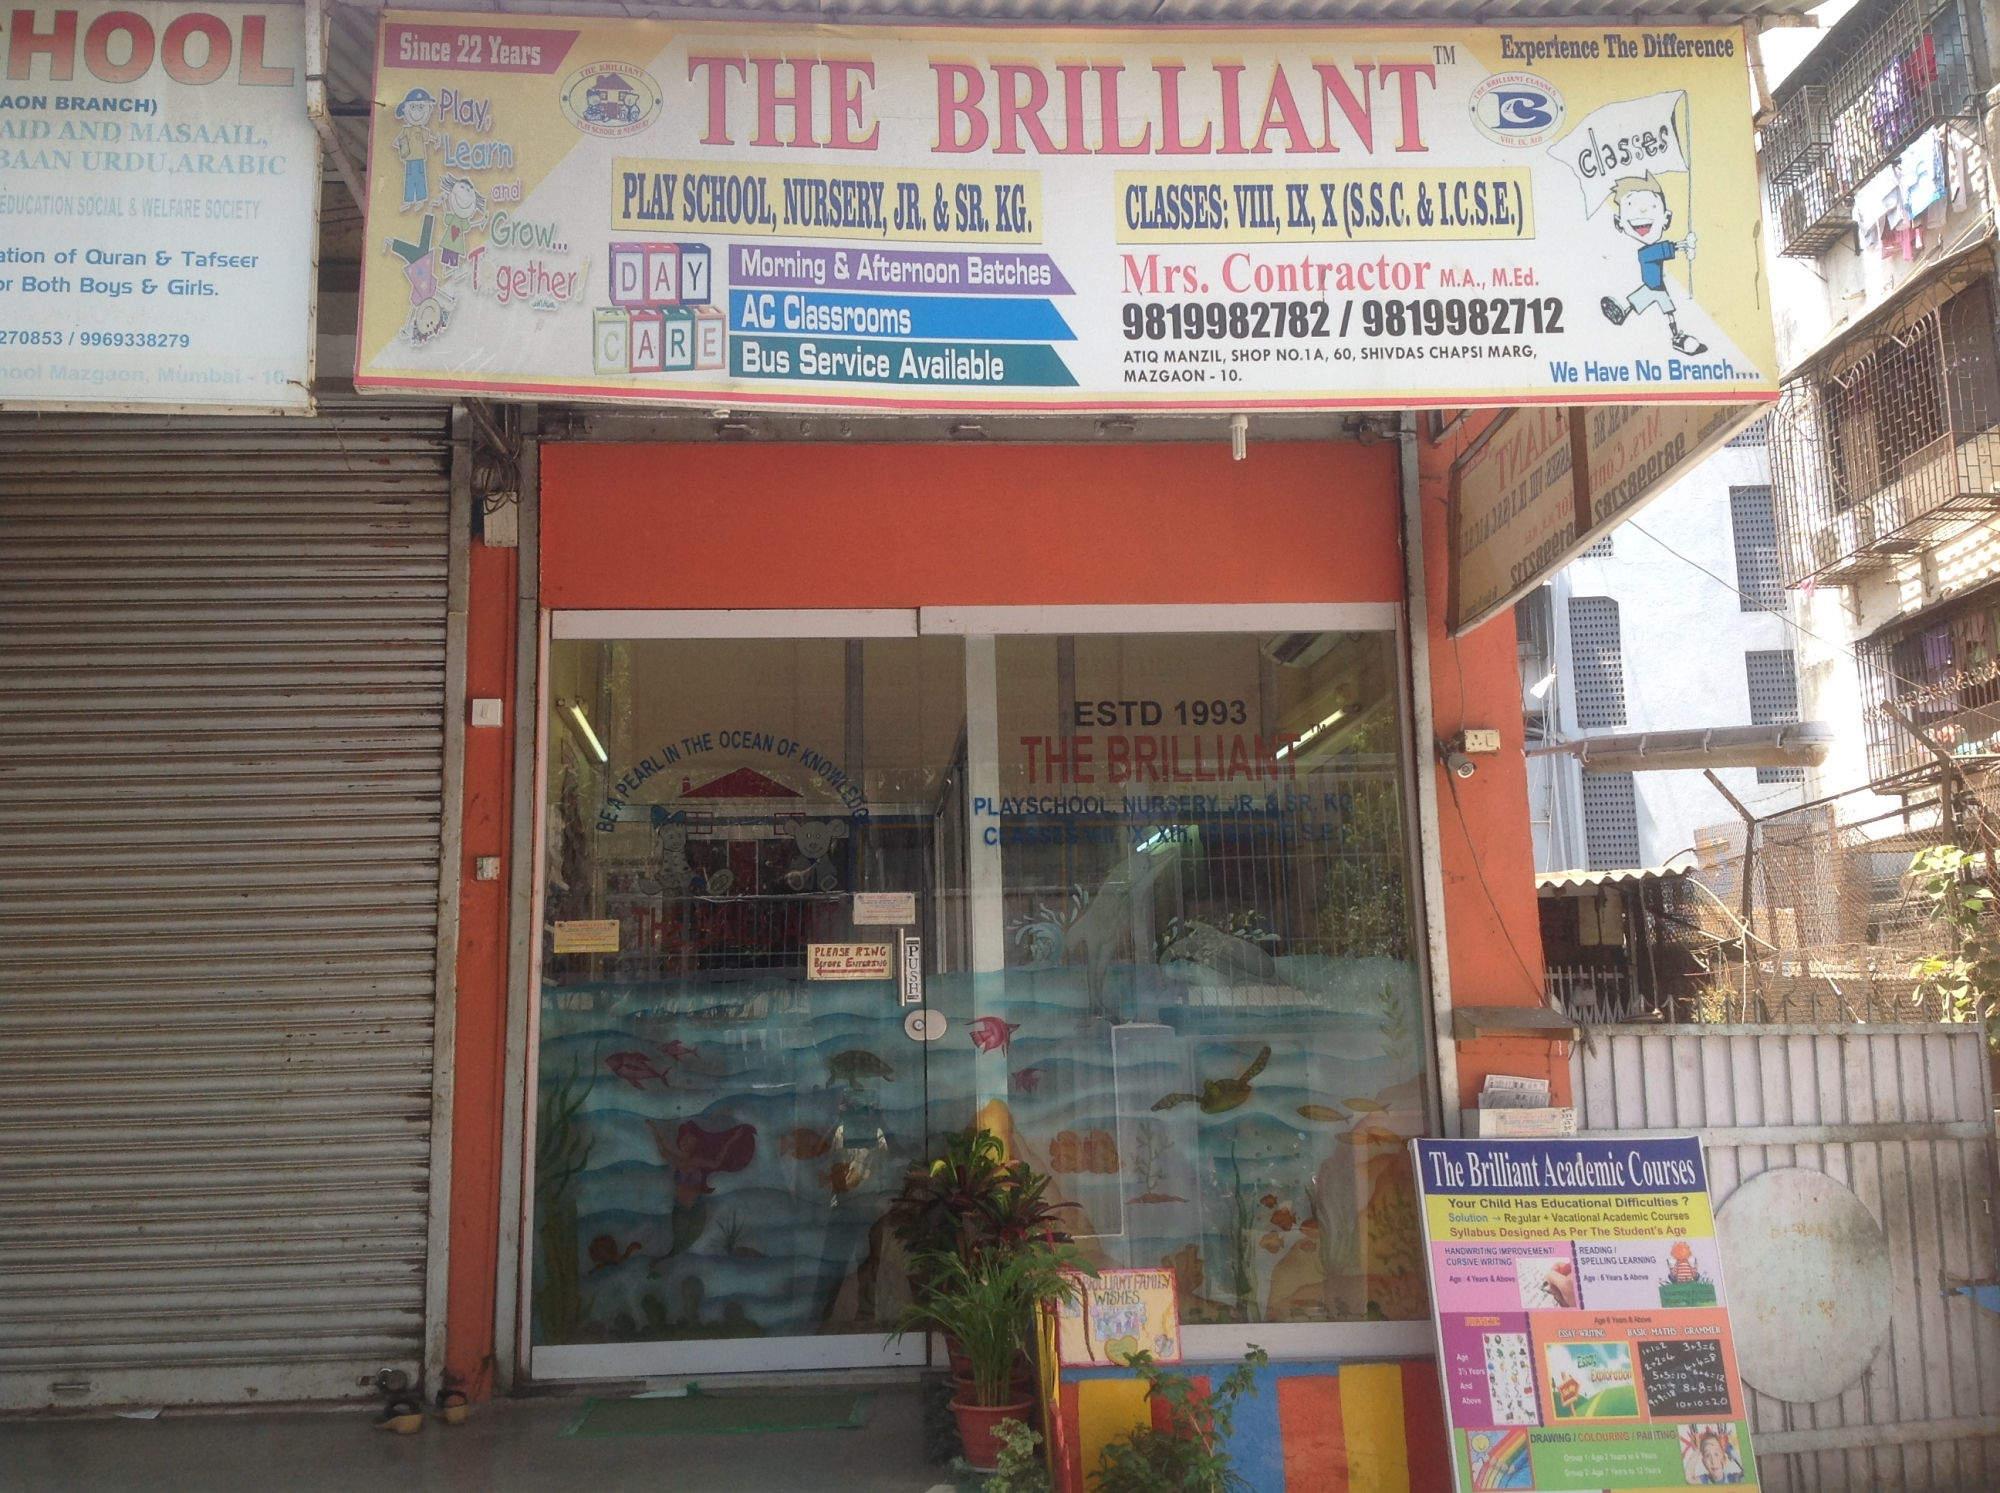 The Brilliant Educational Institue - Mazgaon - Mumbai Image